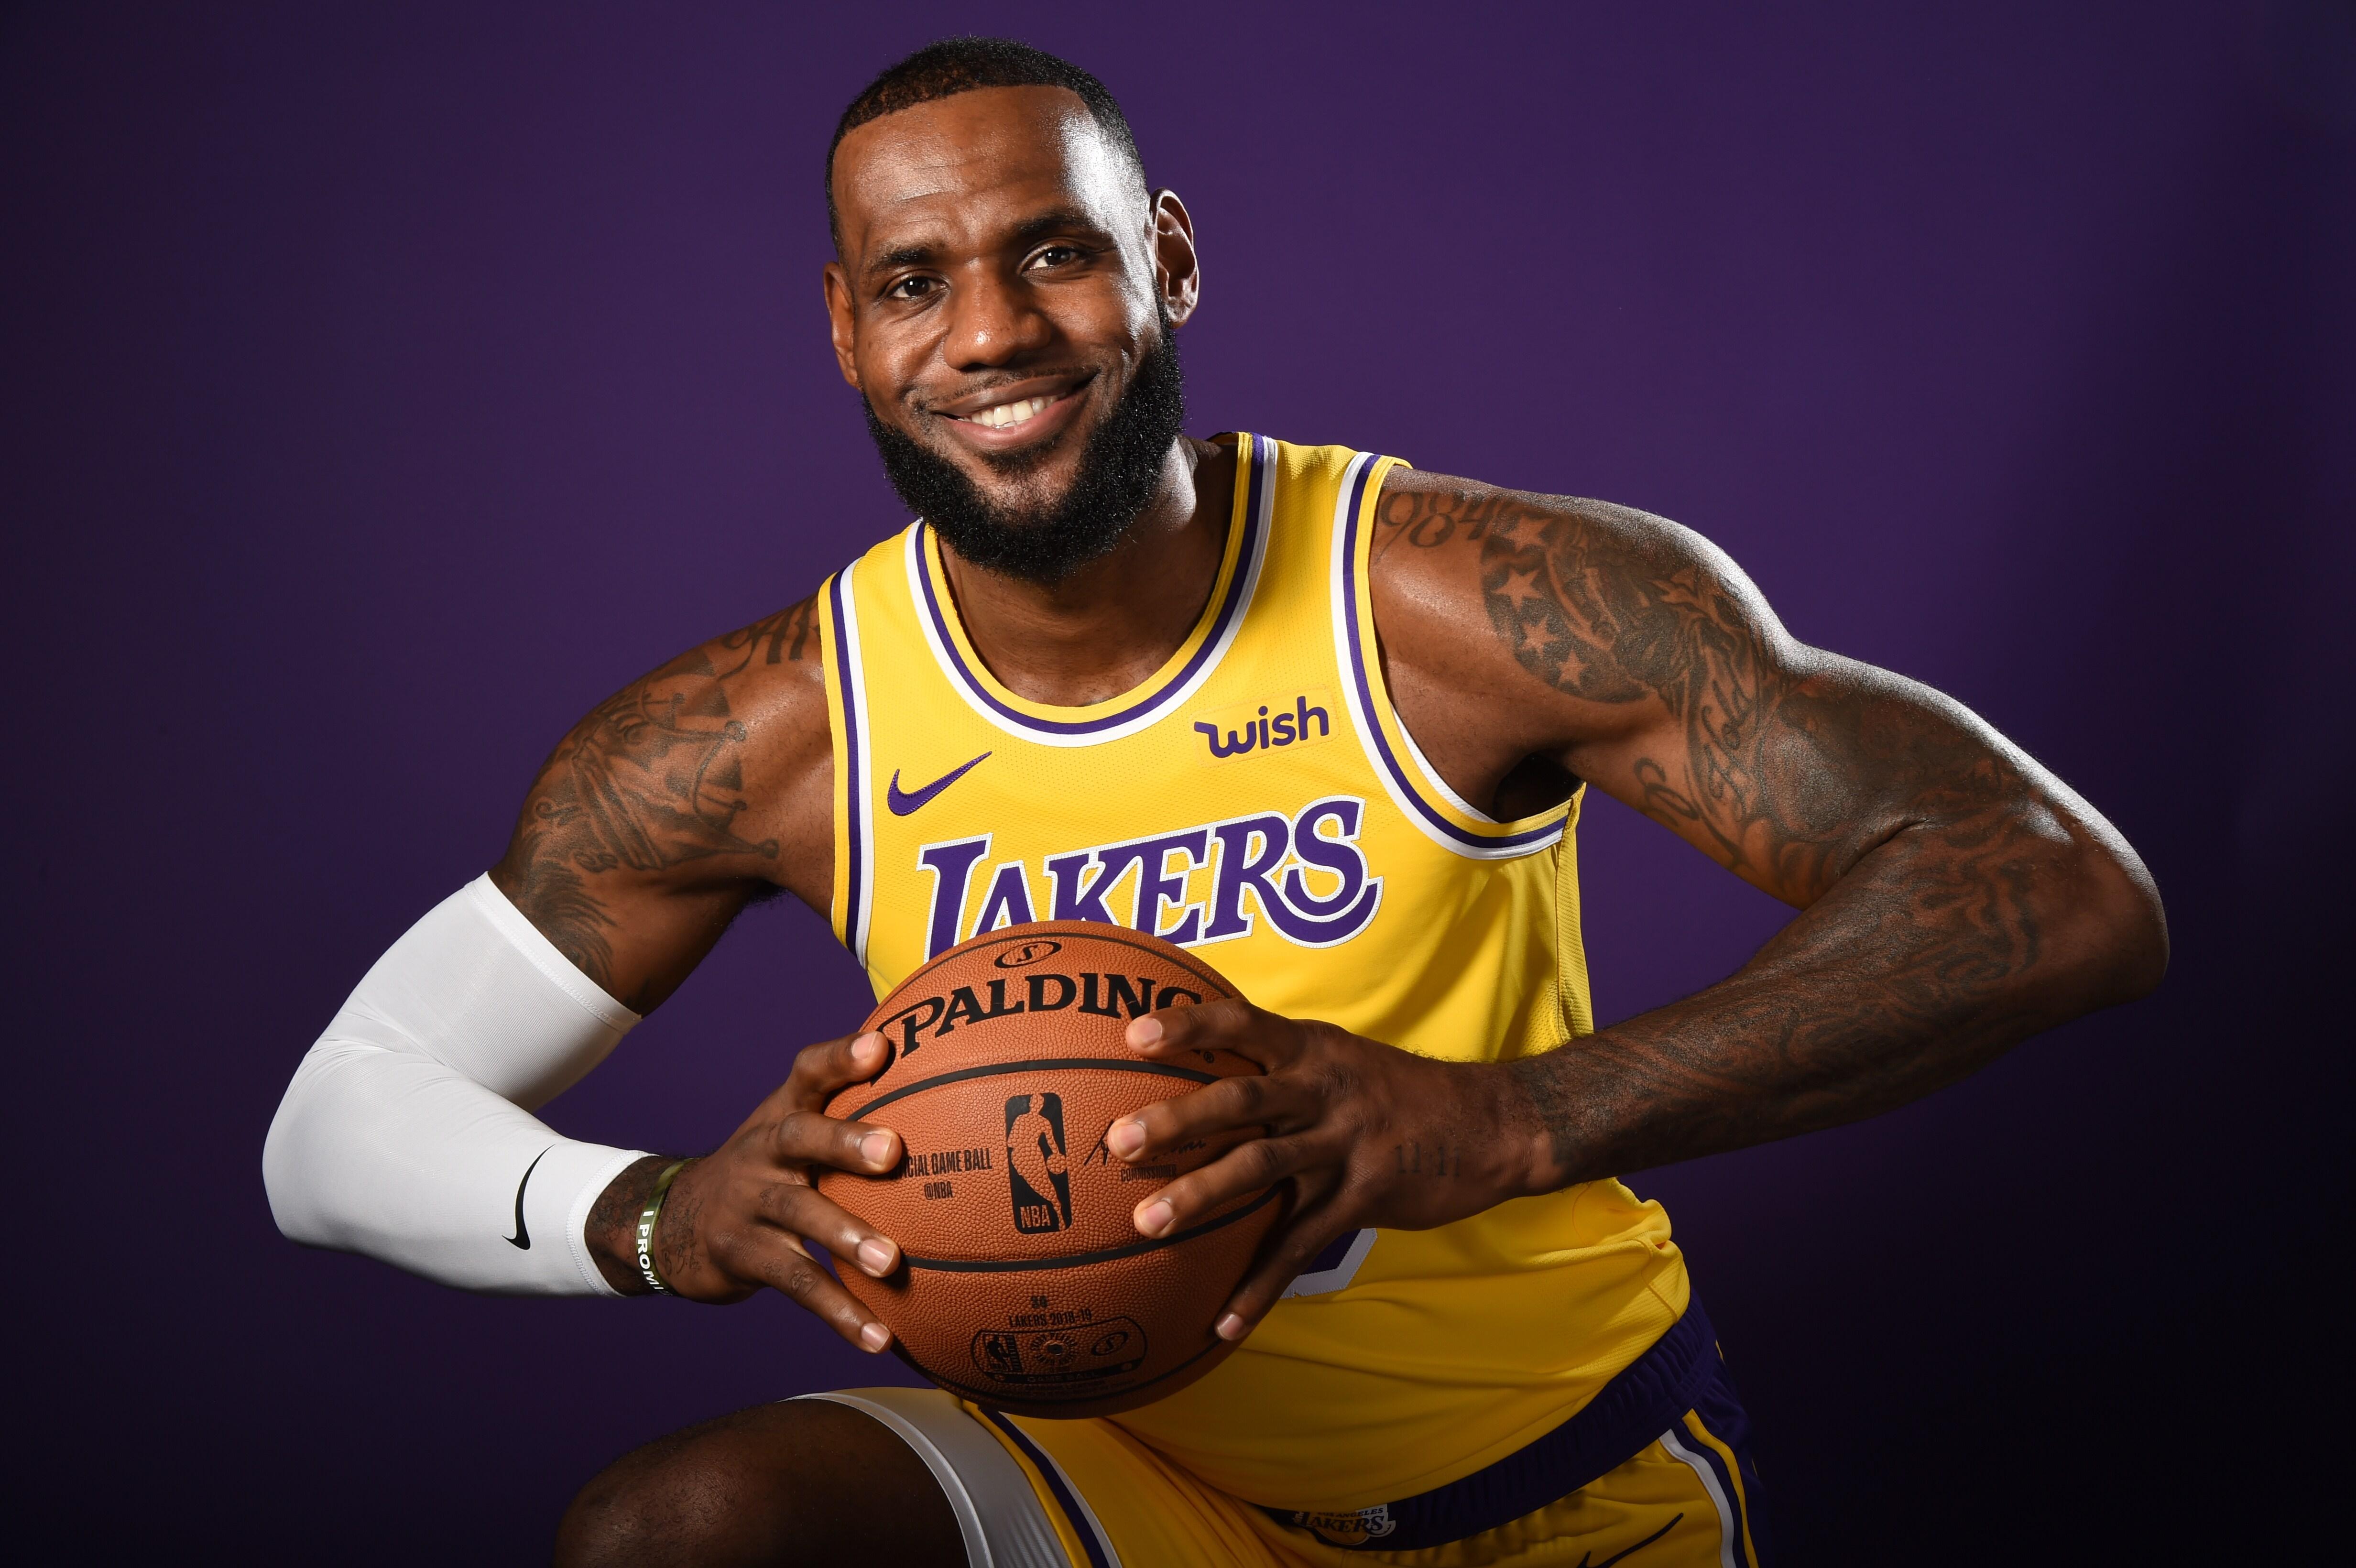 lebron james 2022 4k 1629408276 - LeBron James 2022 4k - LeBron James 2022 wallpapers, LeBron James 2022 4k wallpapers